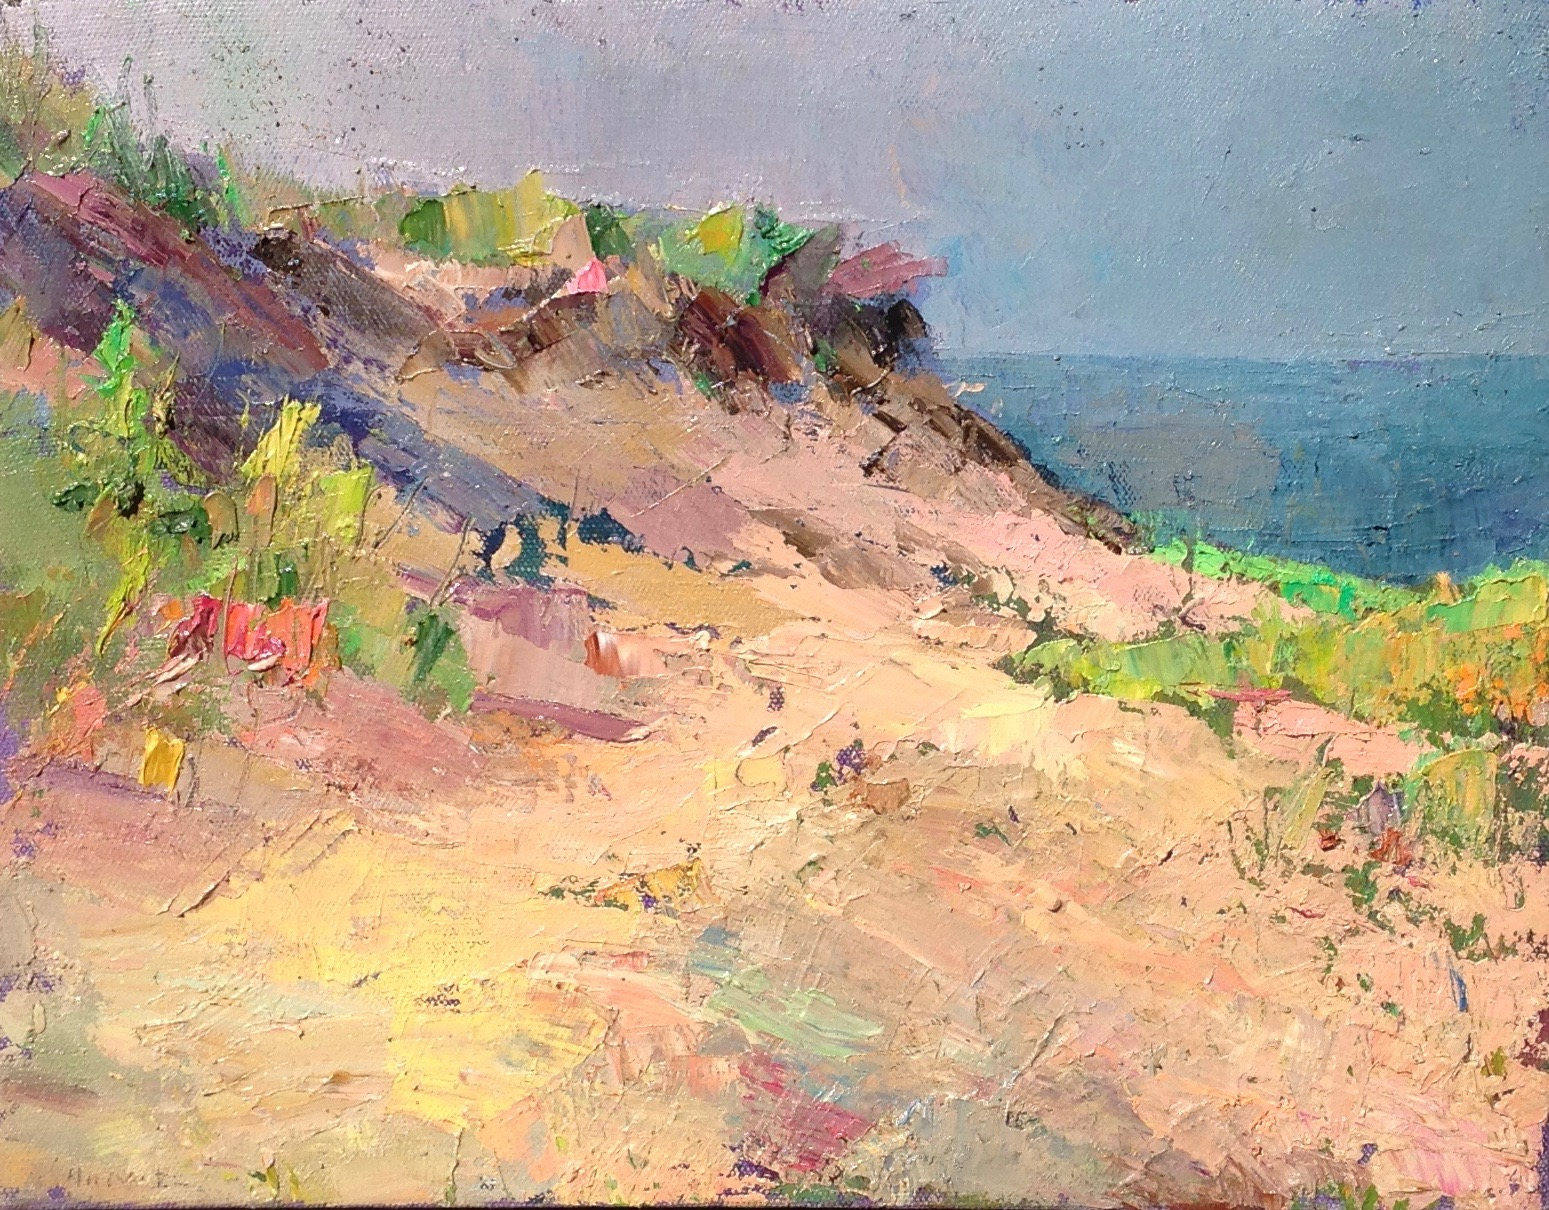 Dunescape,  Larry Horowiz